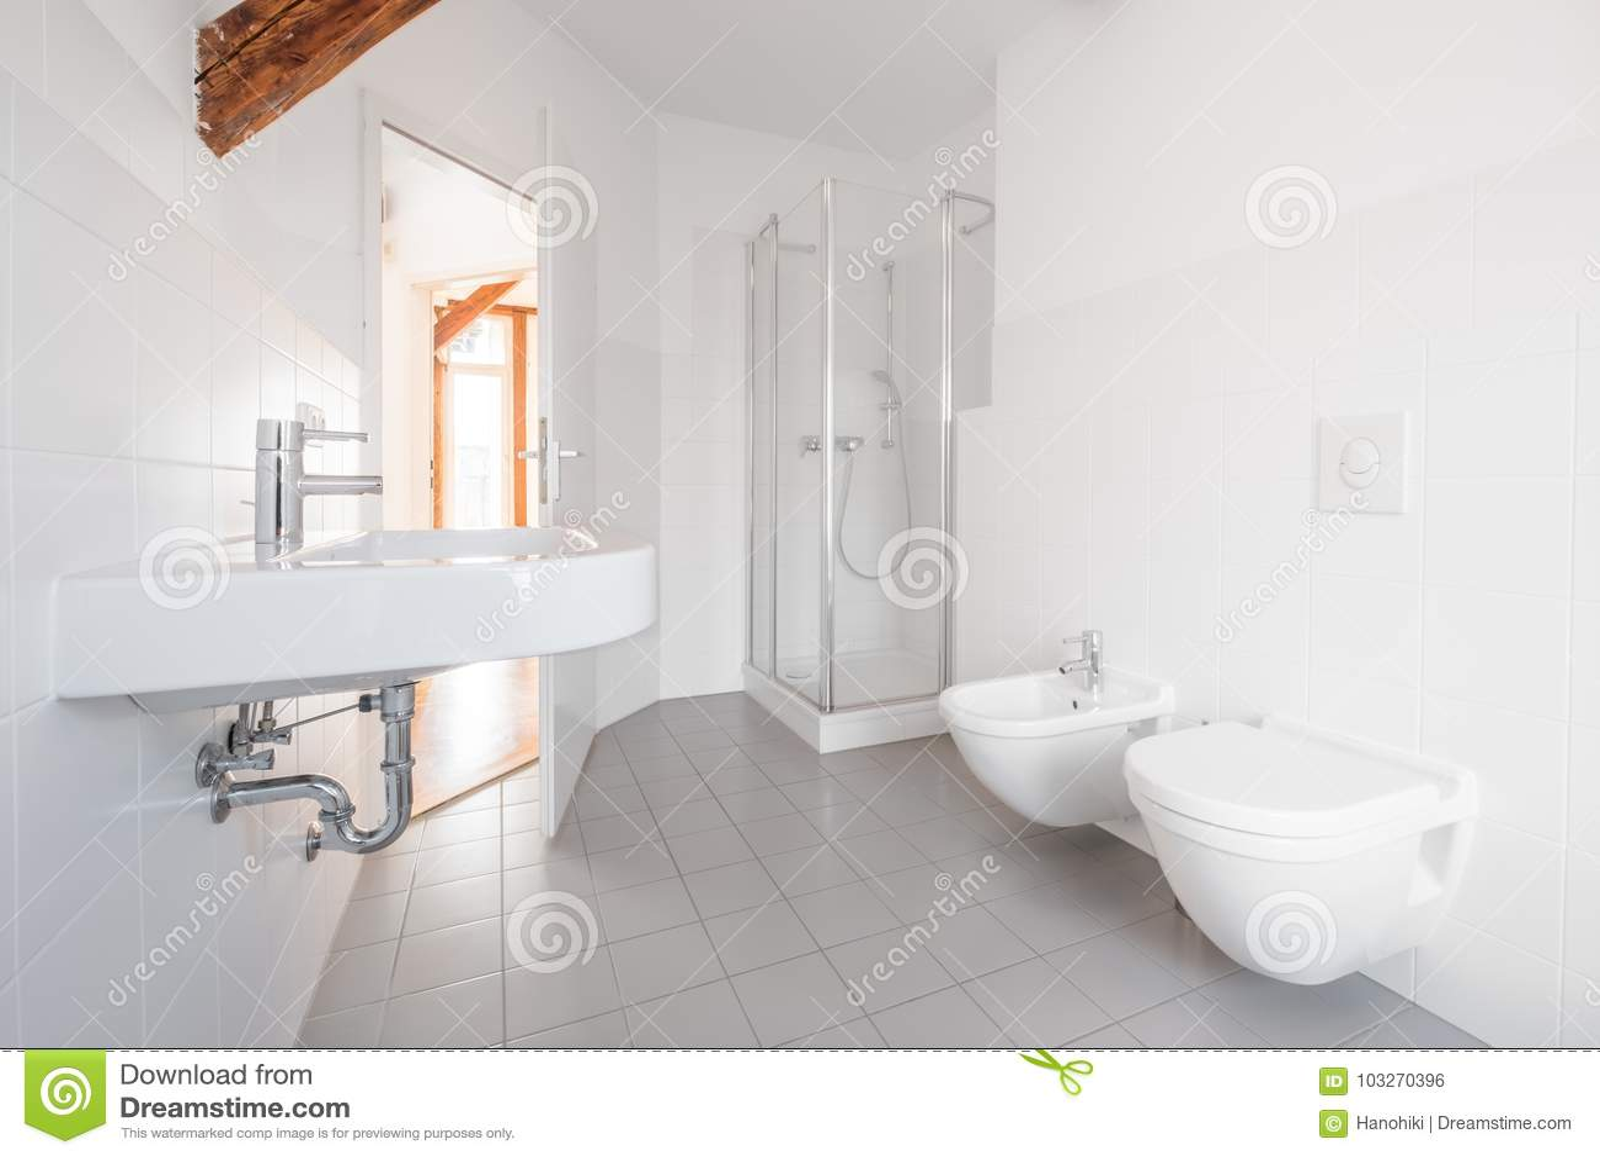 Modern Bathroom - White Tiled Bath With Shower Stock Photo - Image ...